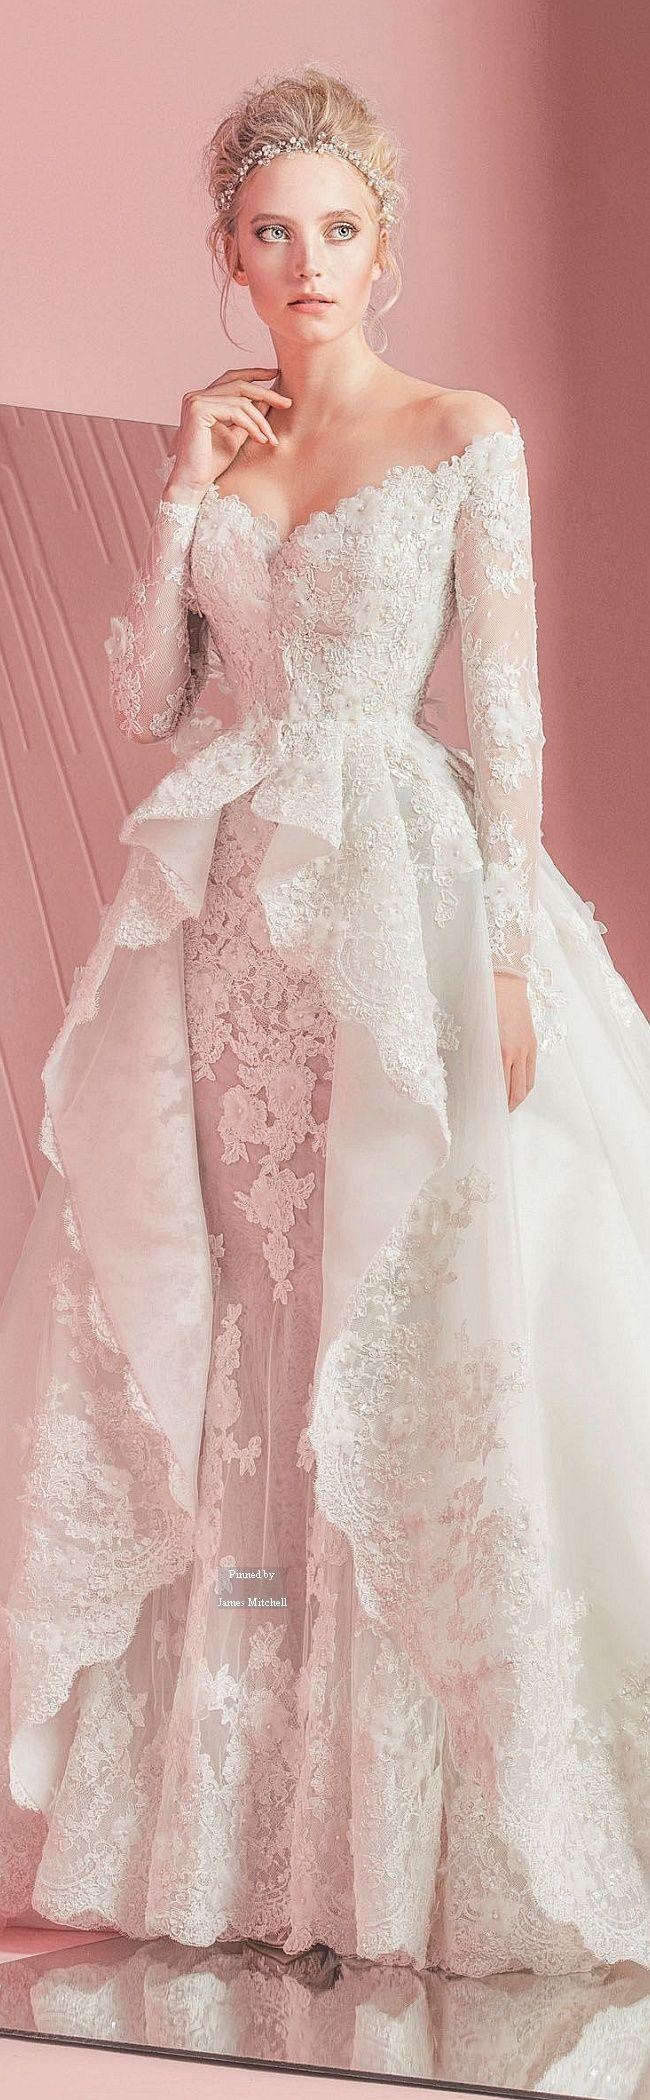 best images about modern bride on pinterest bridal